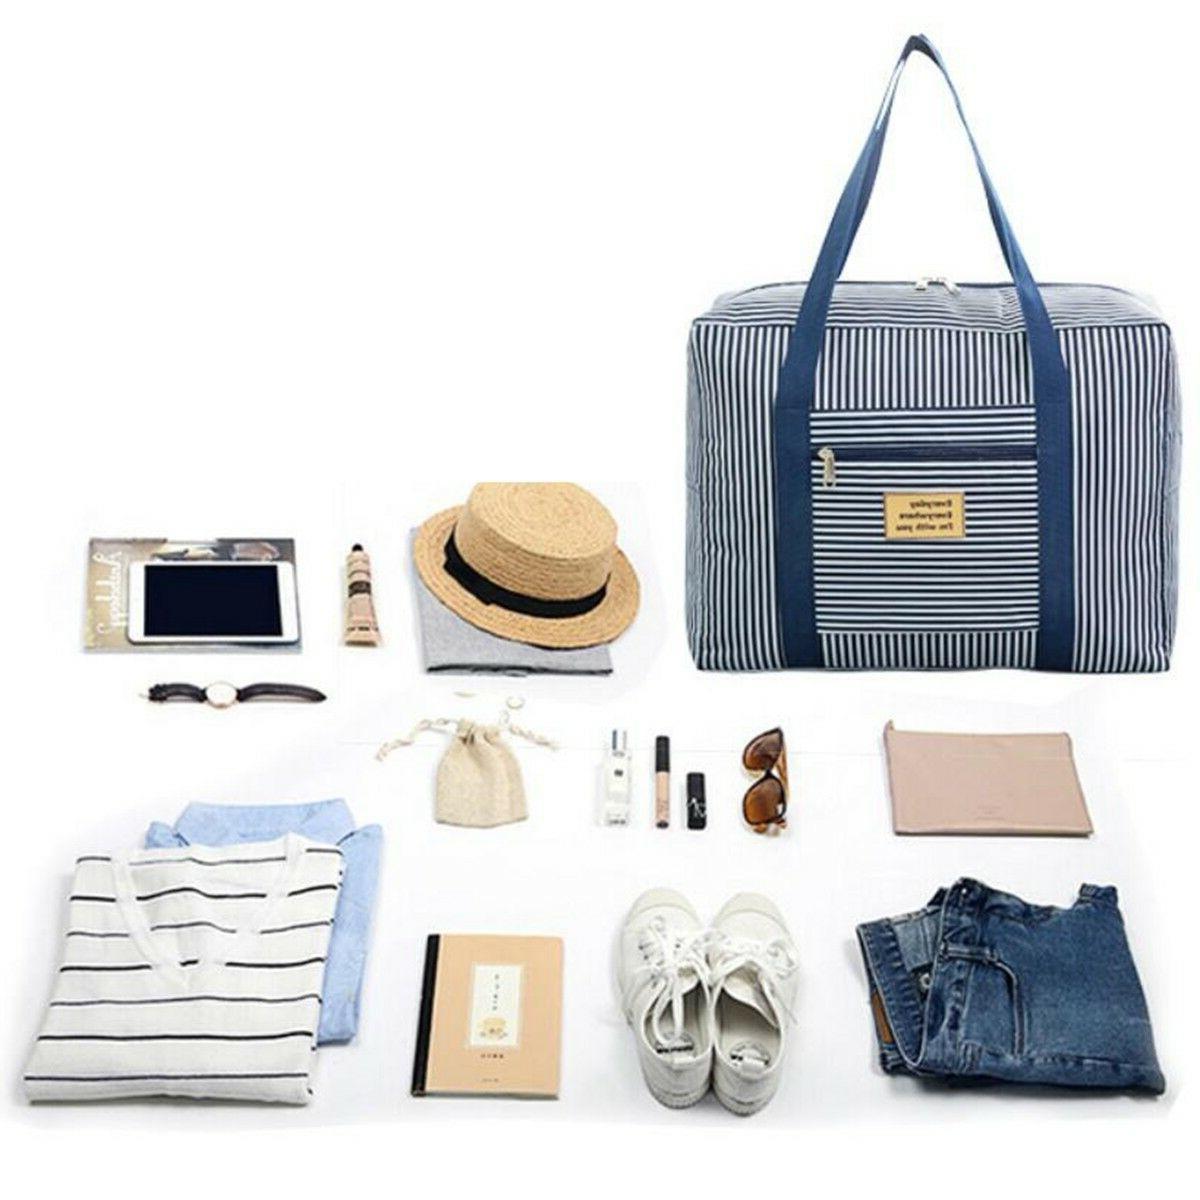 Waterproof Portable Bag large Capacity Luggage Packing Bag